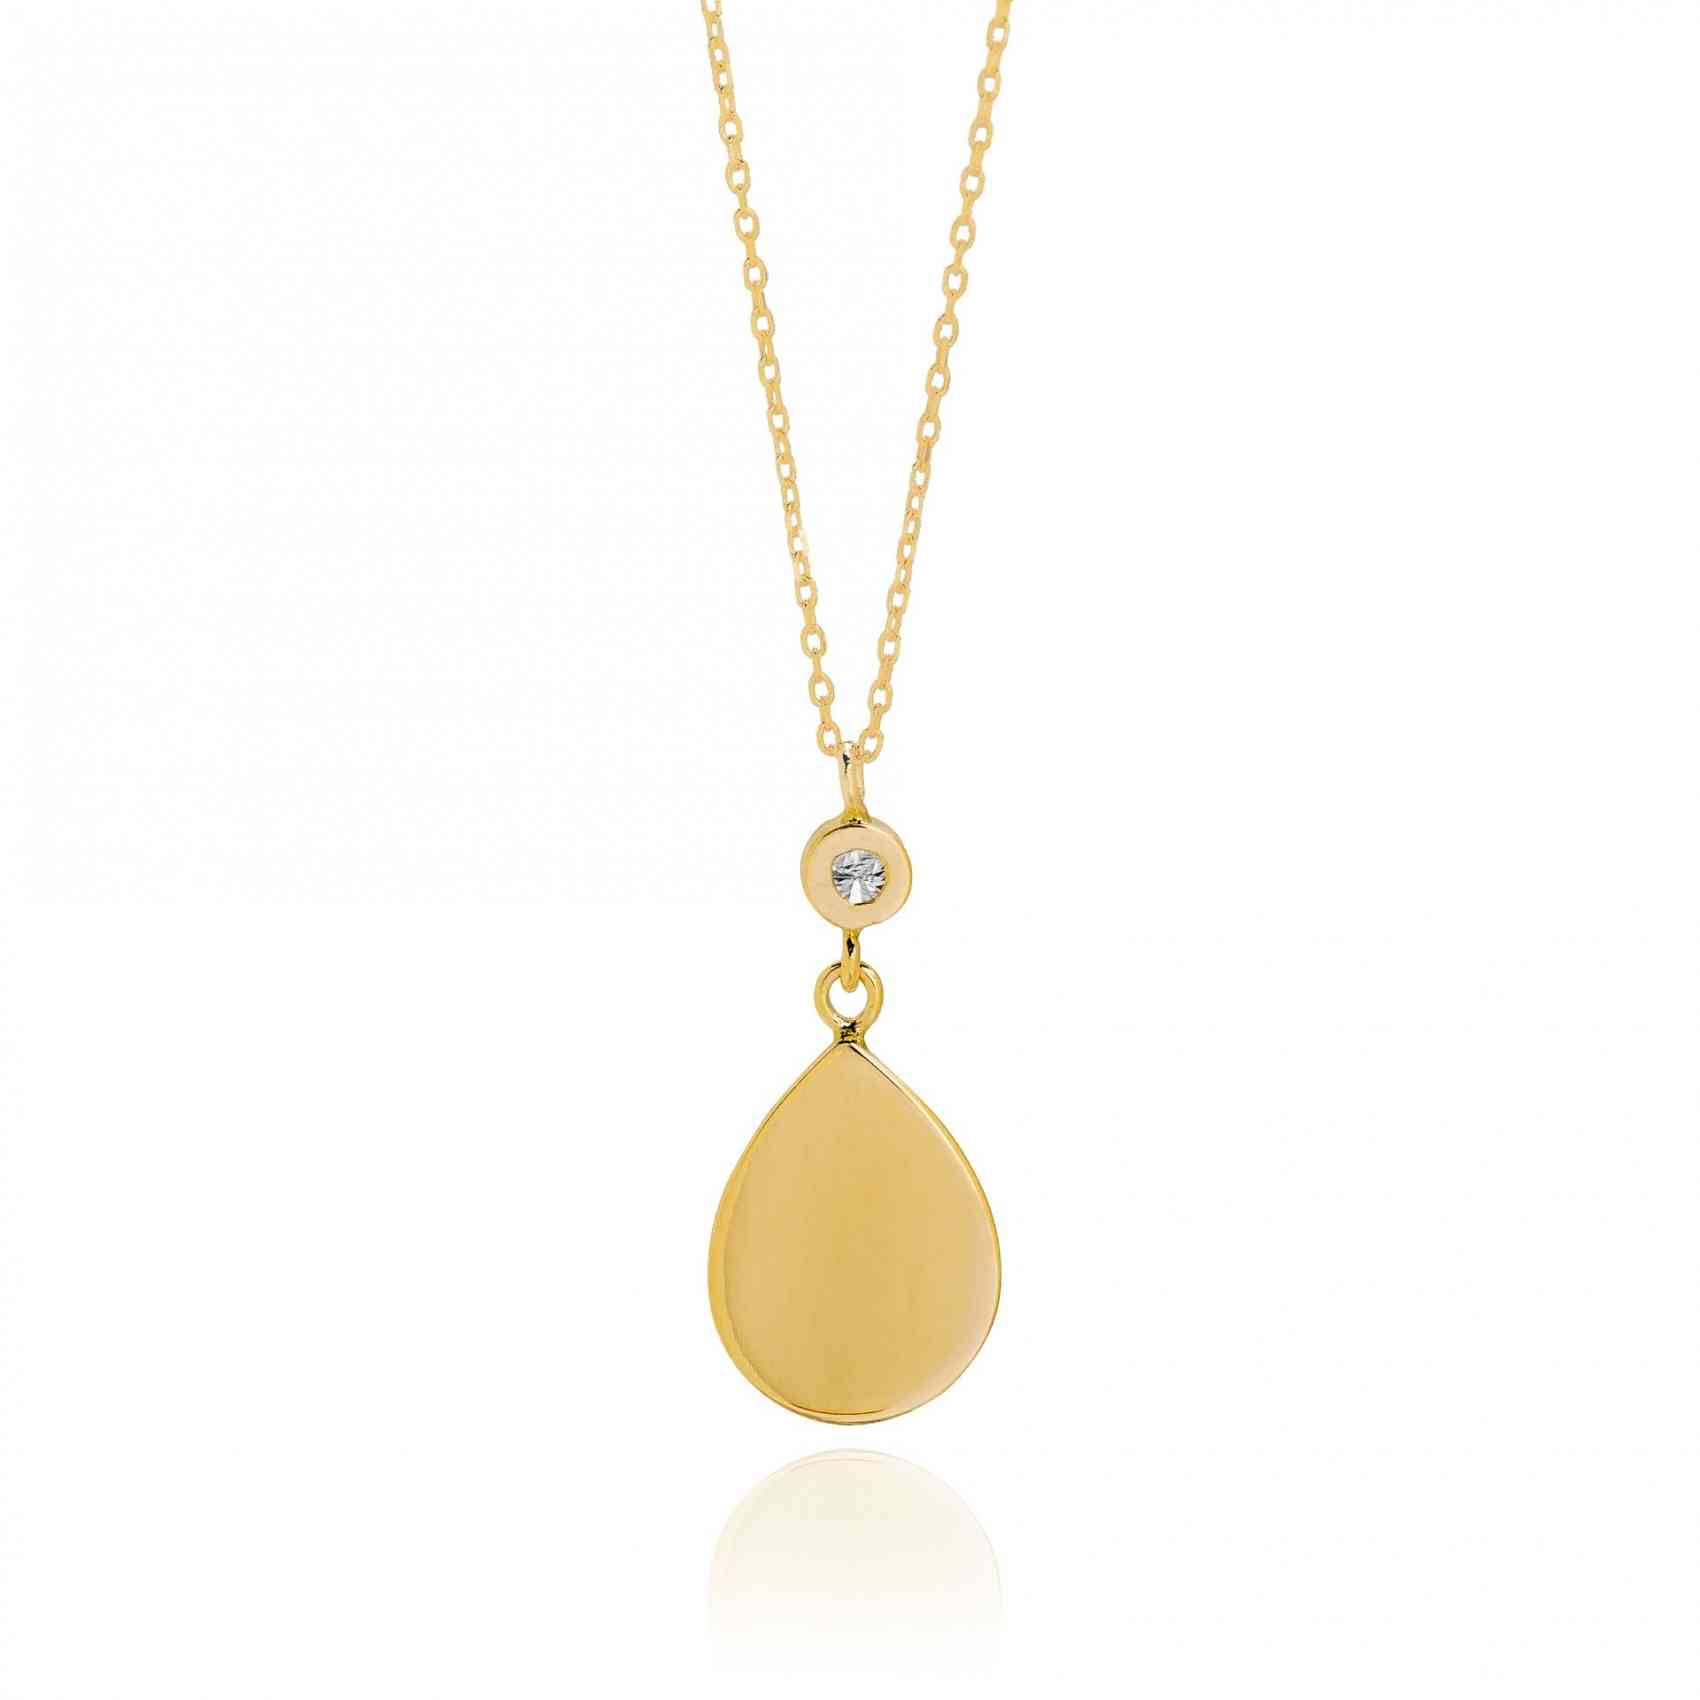 Colier din Aur Galben de 18K cu Safir Maro si Diamant